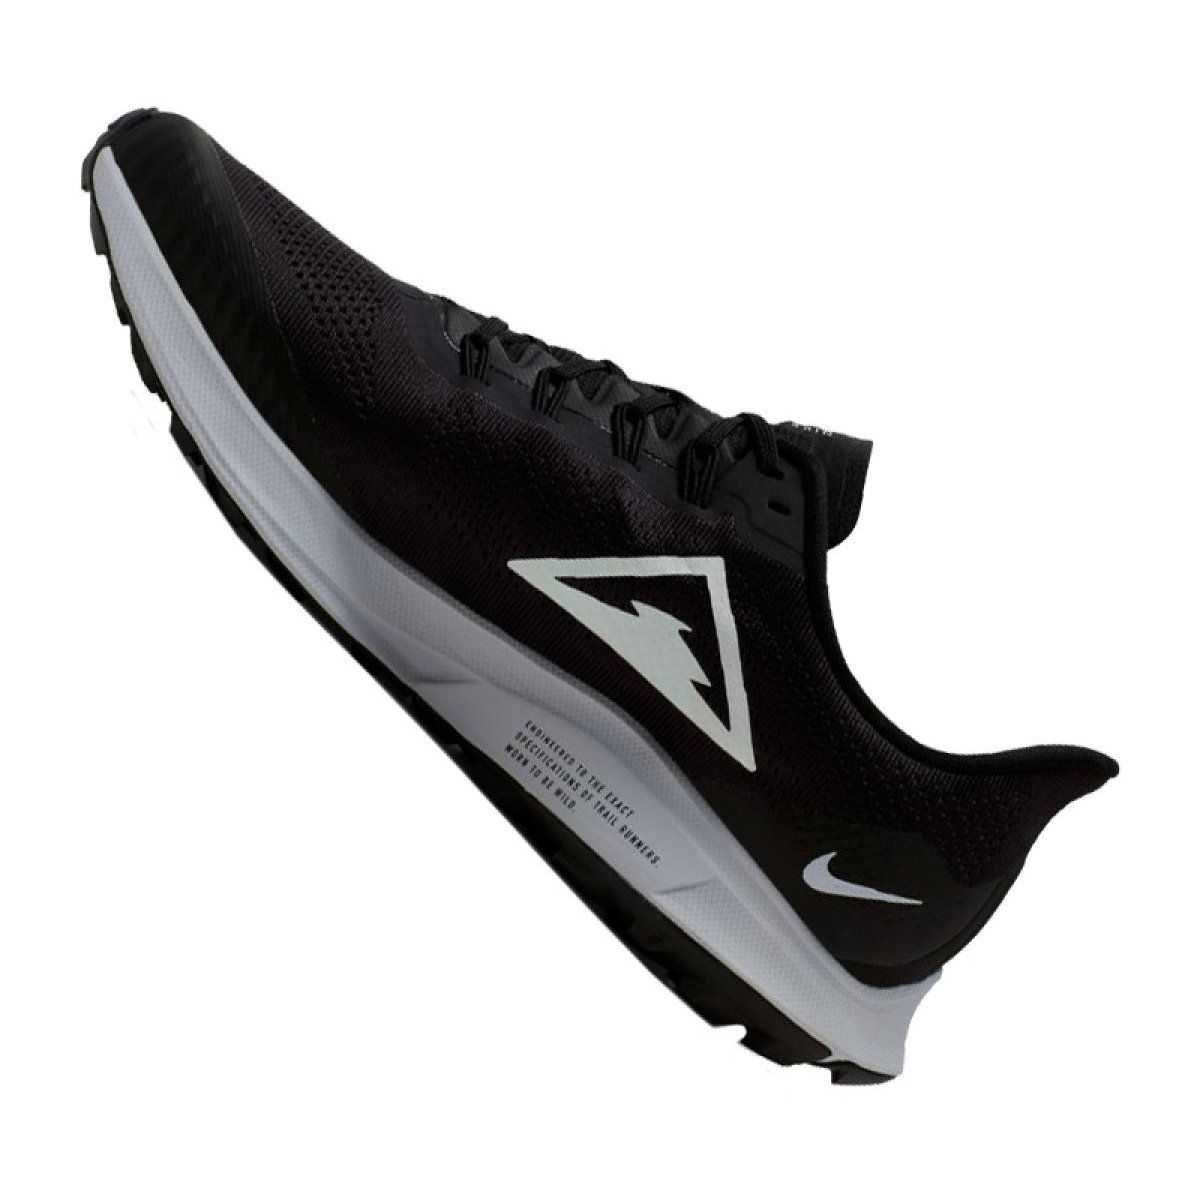 Buty Biegowe Nike Air Zoom Pegasus 36 Trail M Ar5677 002 Czarne Nike Air Zoom Pegasus Black Running Shoes Nike Air